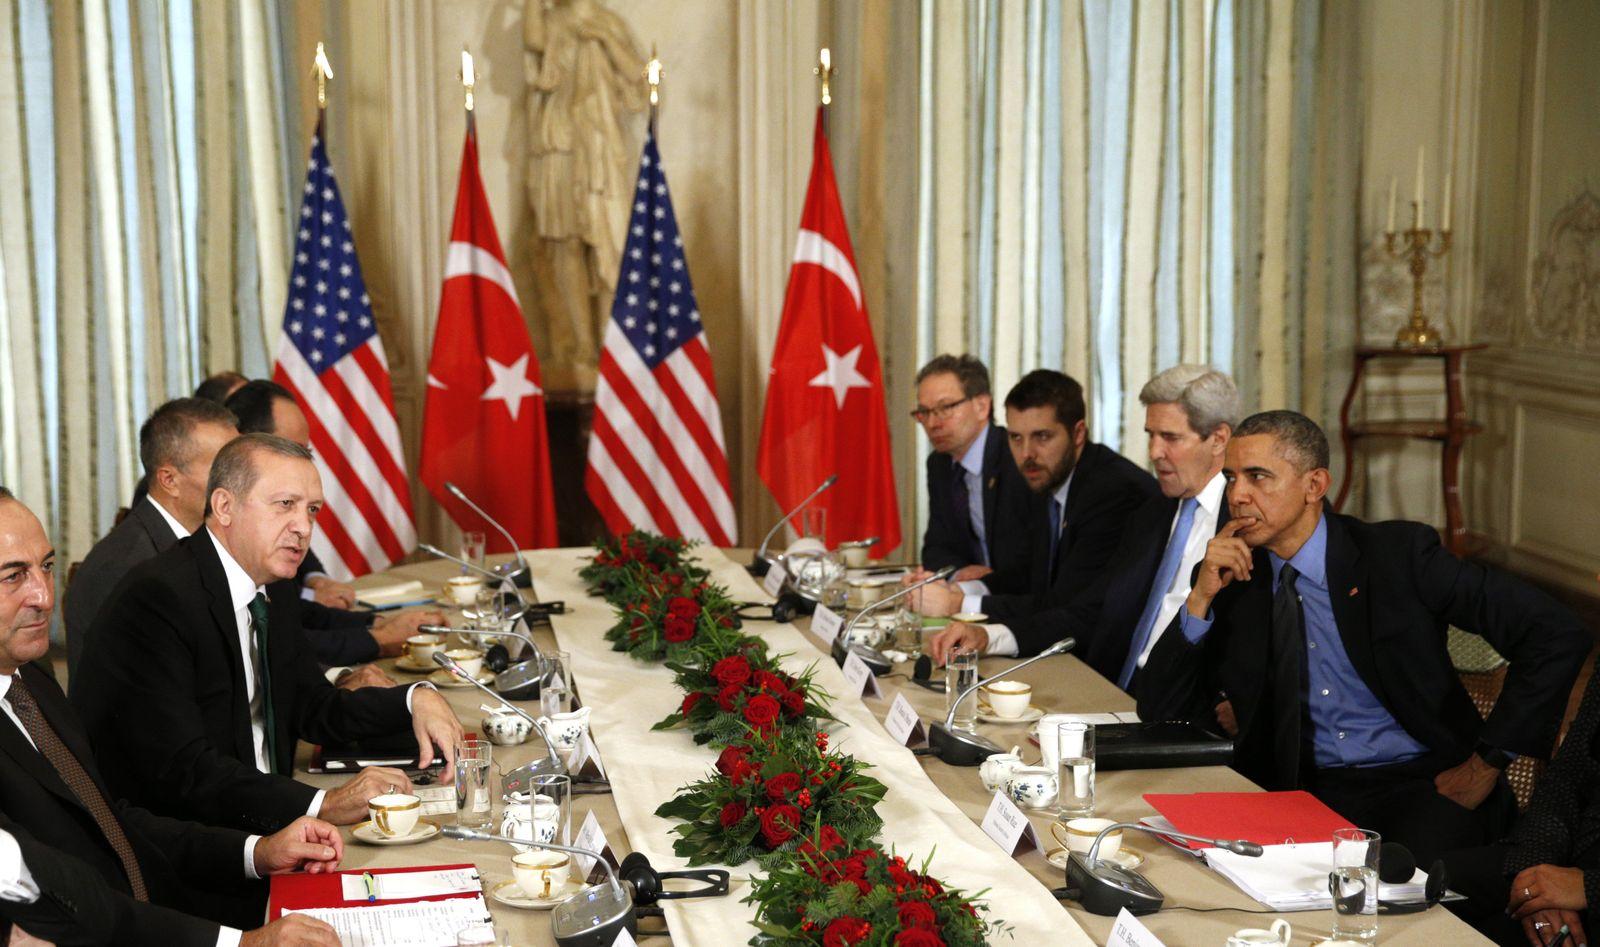 Recep Tayyip Erdogan / Barack Obama